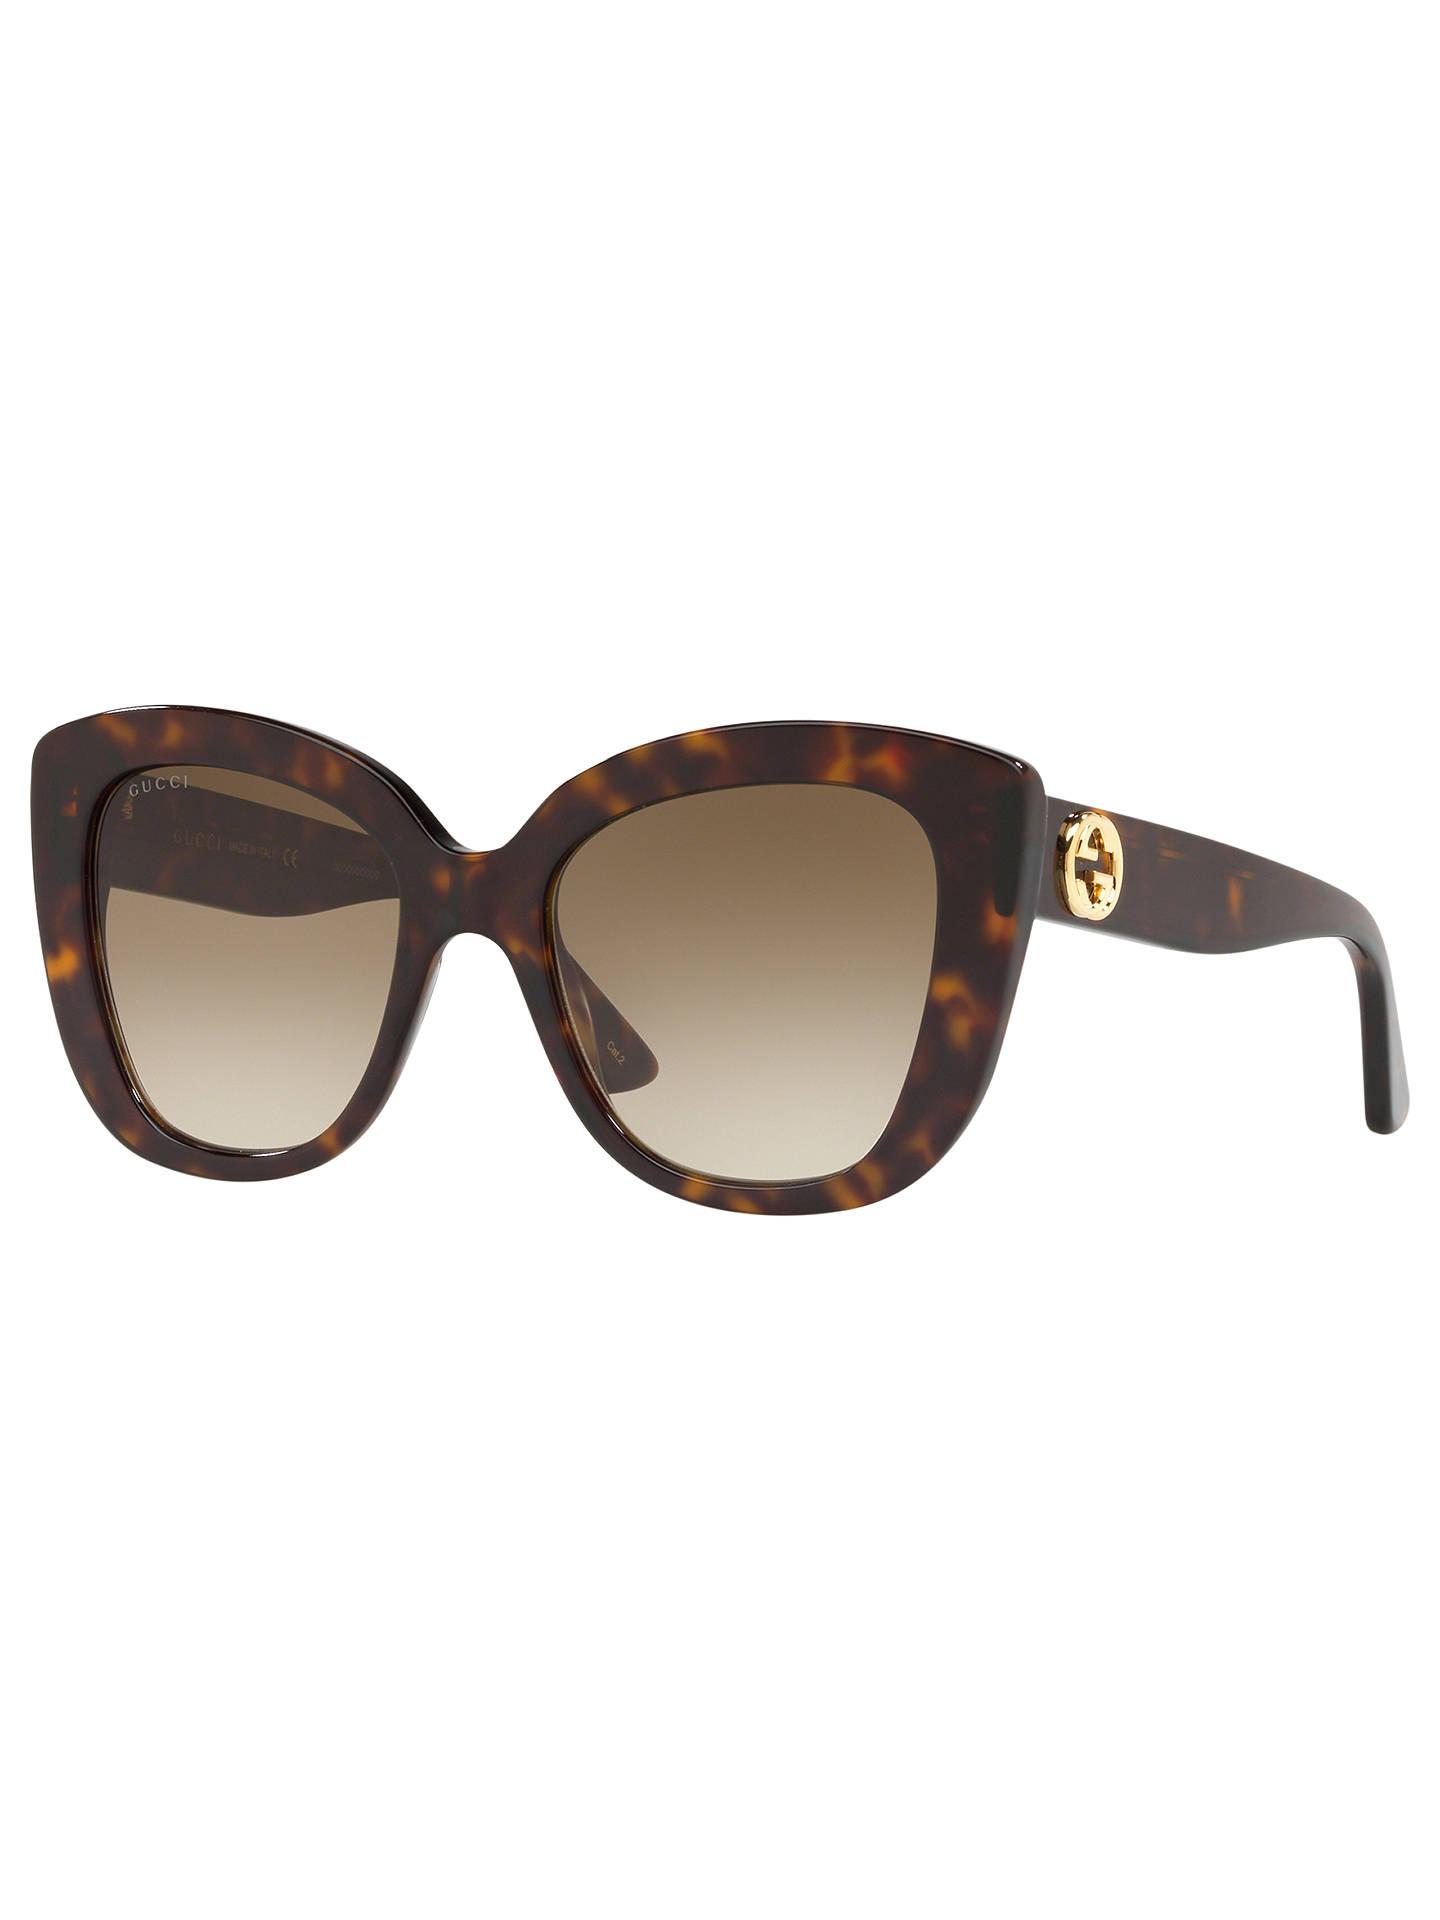 839a97593c Gucci GG0327S Women s Cat s Eye Sunglasses at John Lewis   Partners